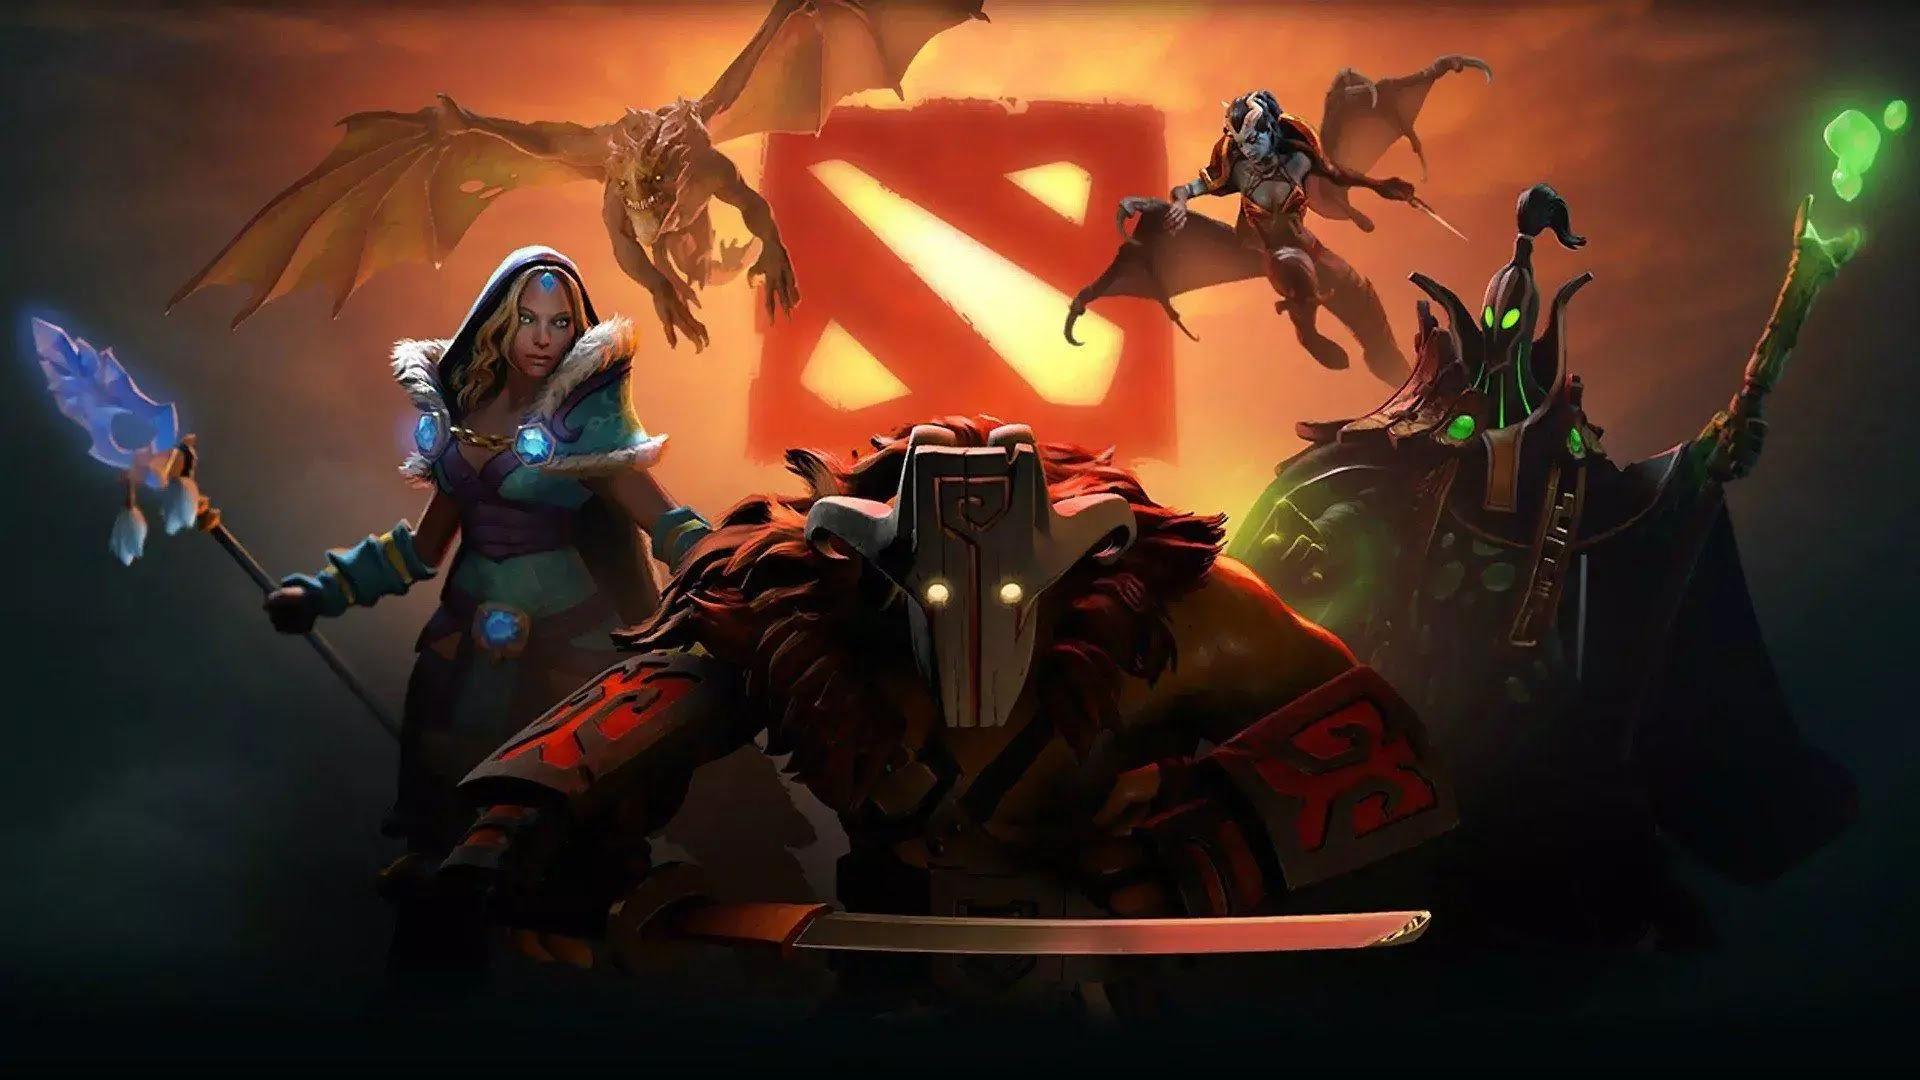 Main Image Rekomendasi Game Warnet - DOTA2